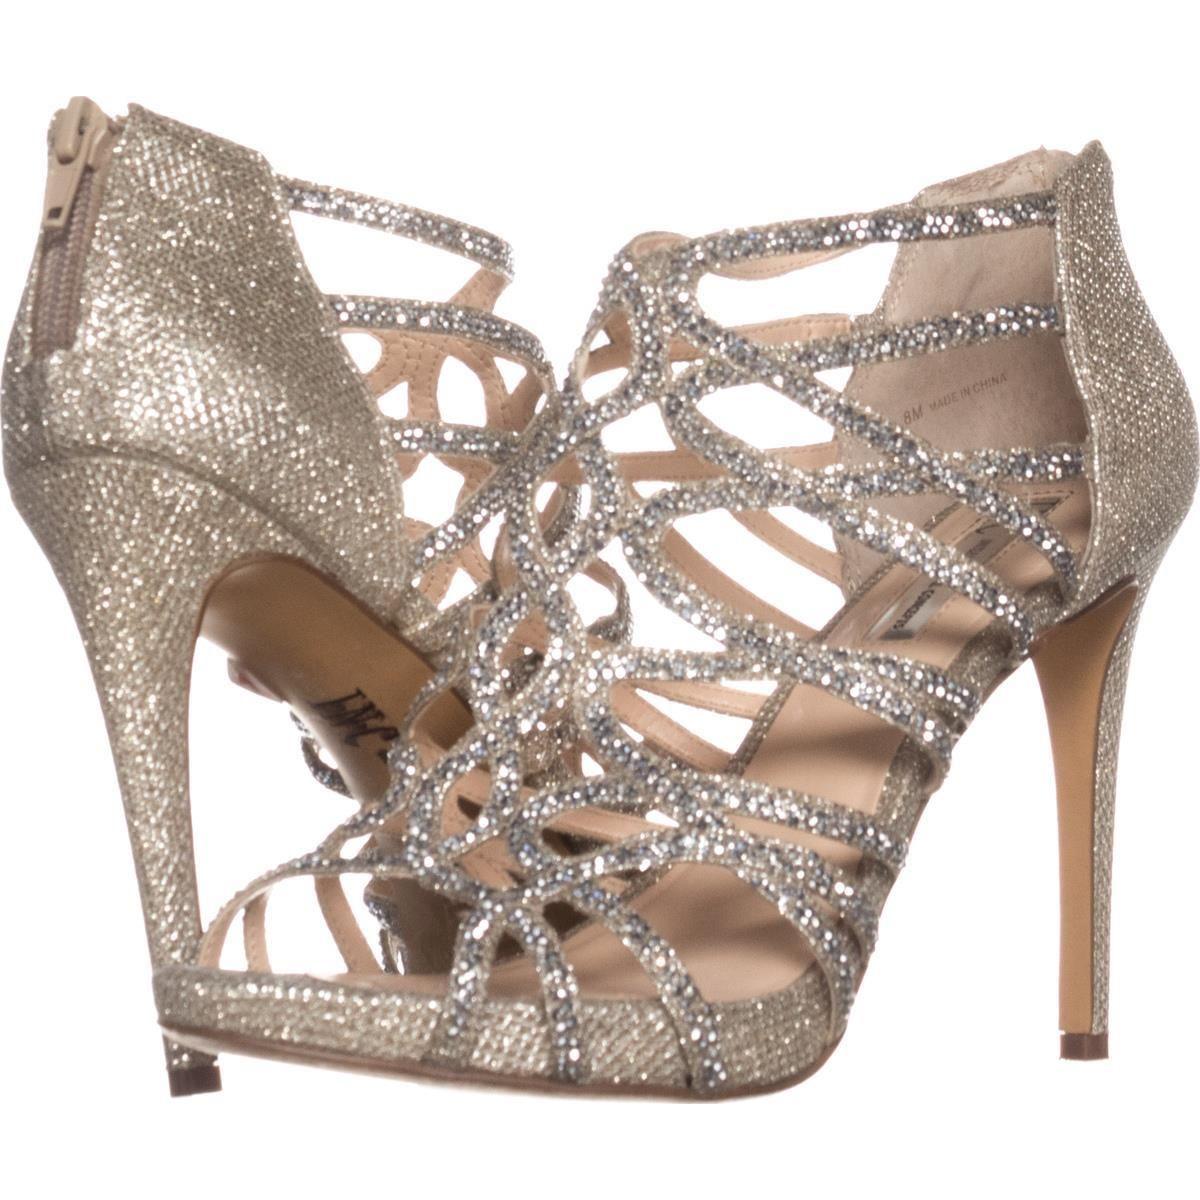 I35 Sharee2 Strappy Sparkle Dress Sandals Champagne 10 UK